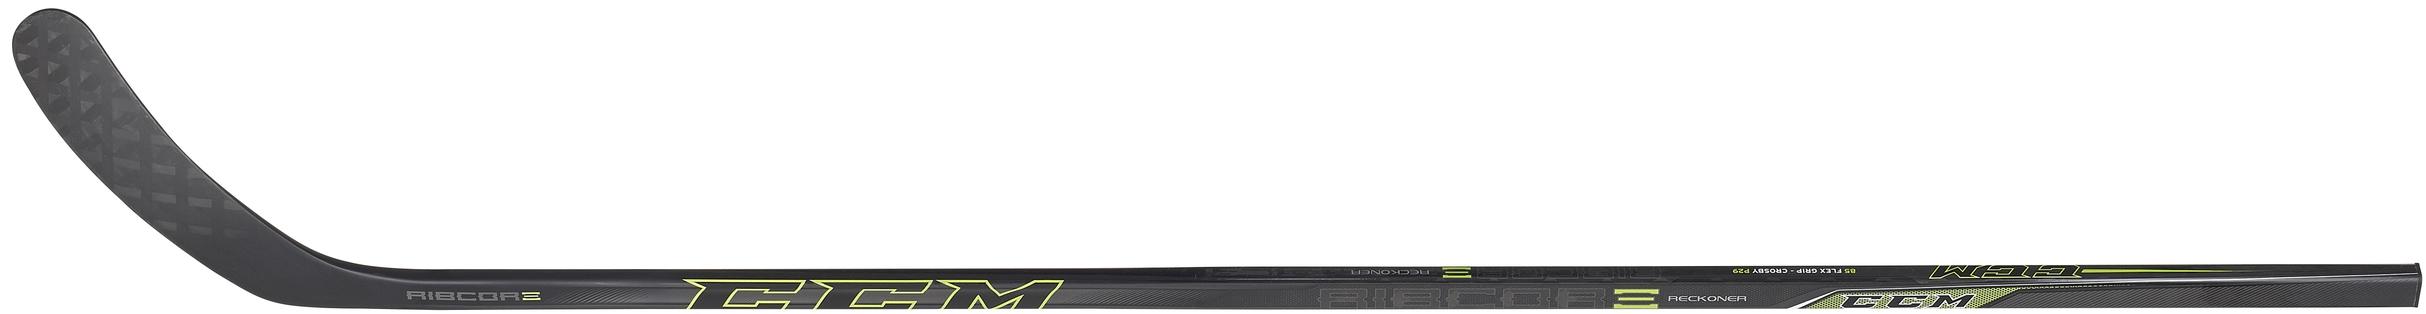 Reebok CCM Ribcor Reckoner Stick, $270